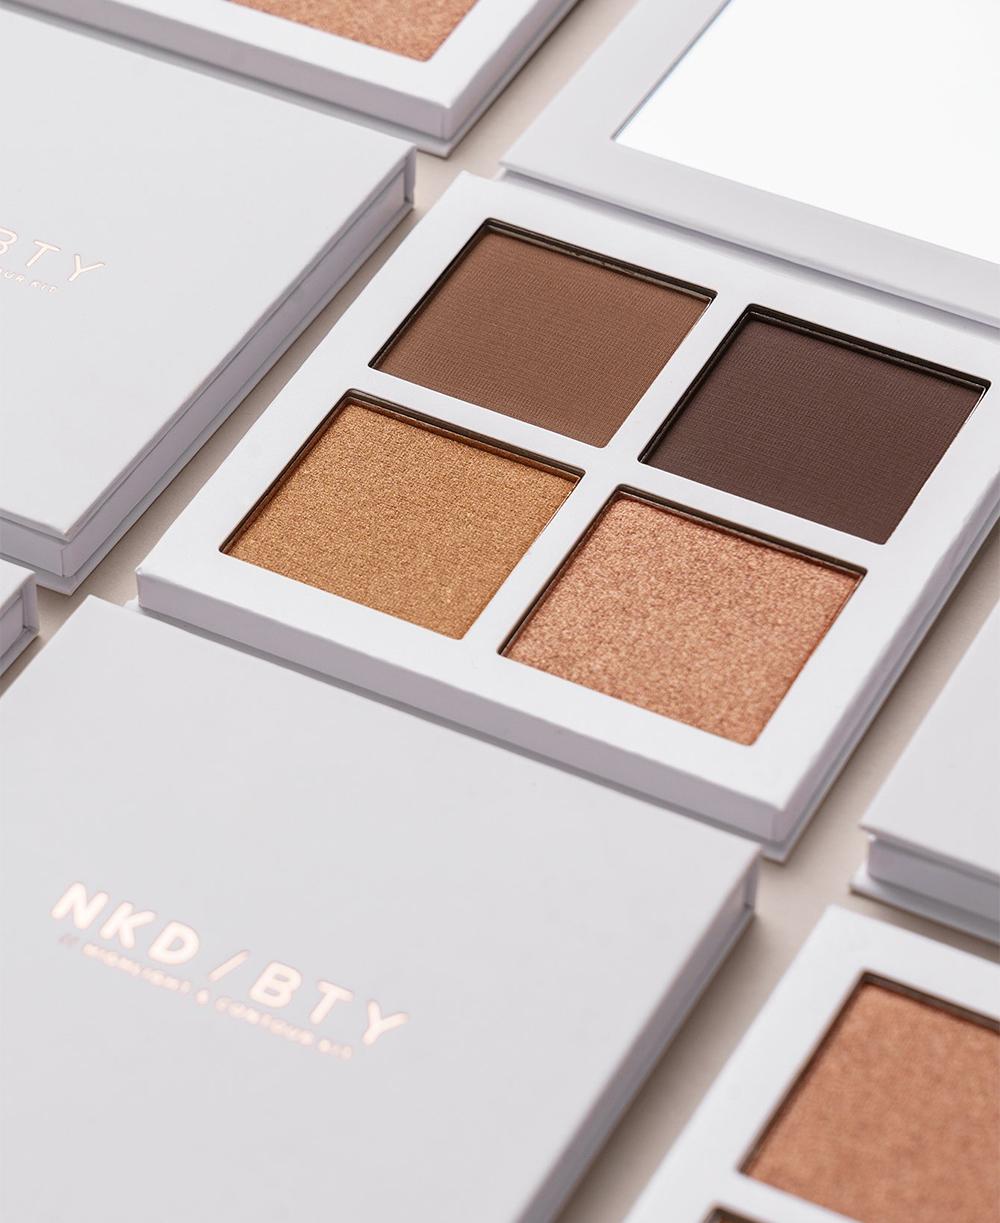 NAKD Beauty NKD / BTY Highlight & Contour Kit Deep Dark